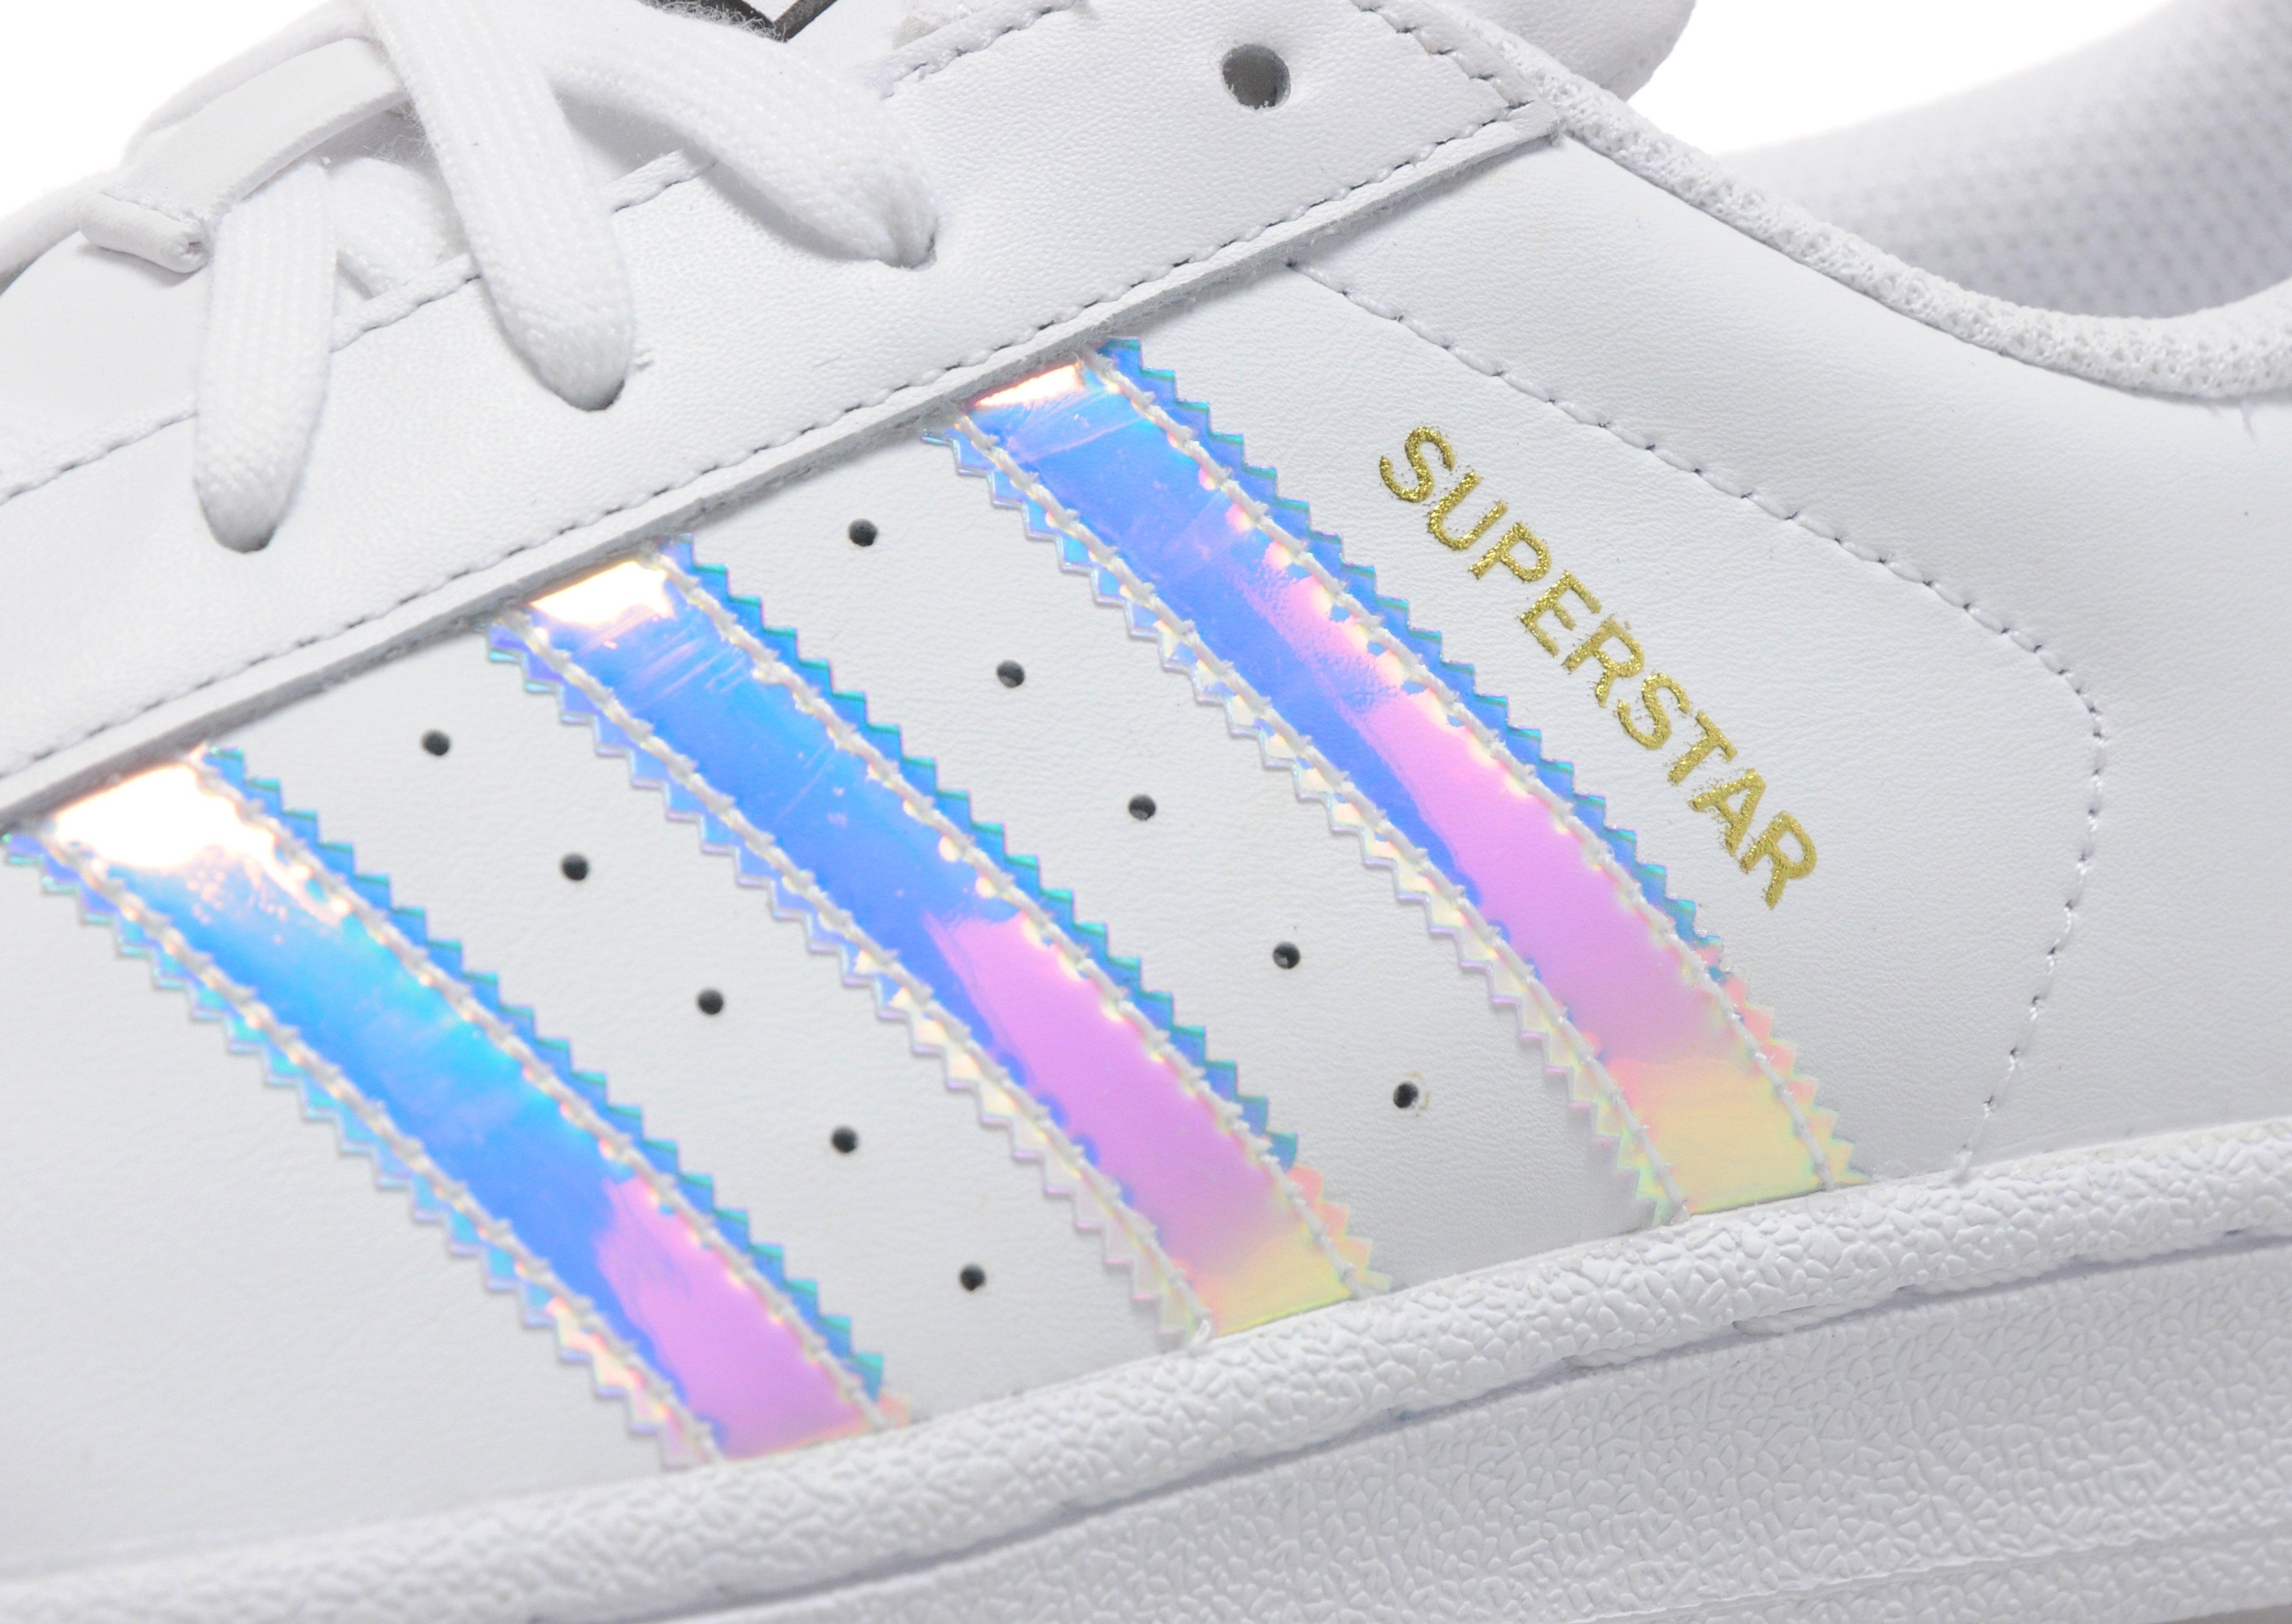 adidas superstar iridescent zalando | Benvenuto per comprare